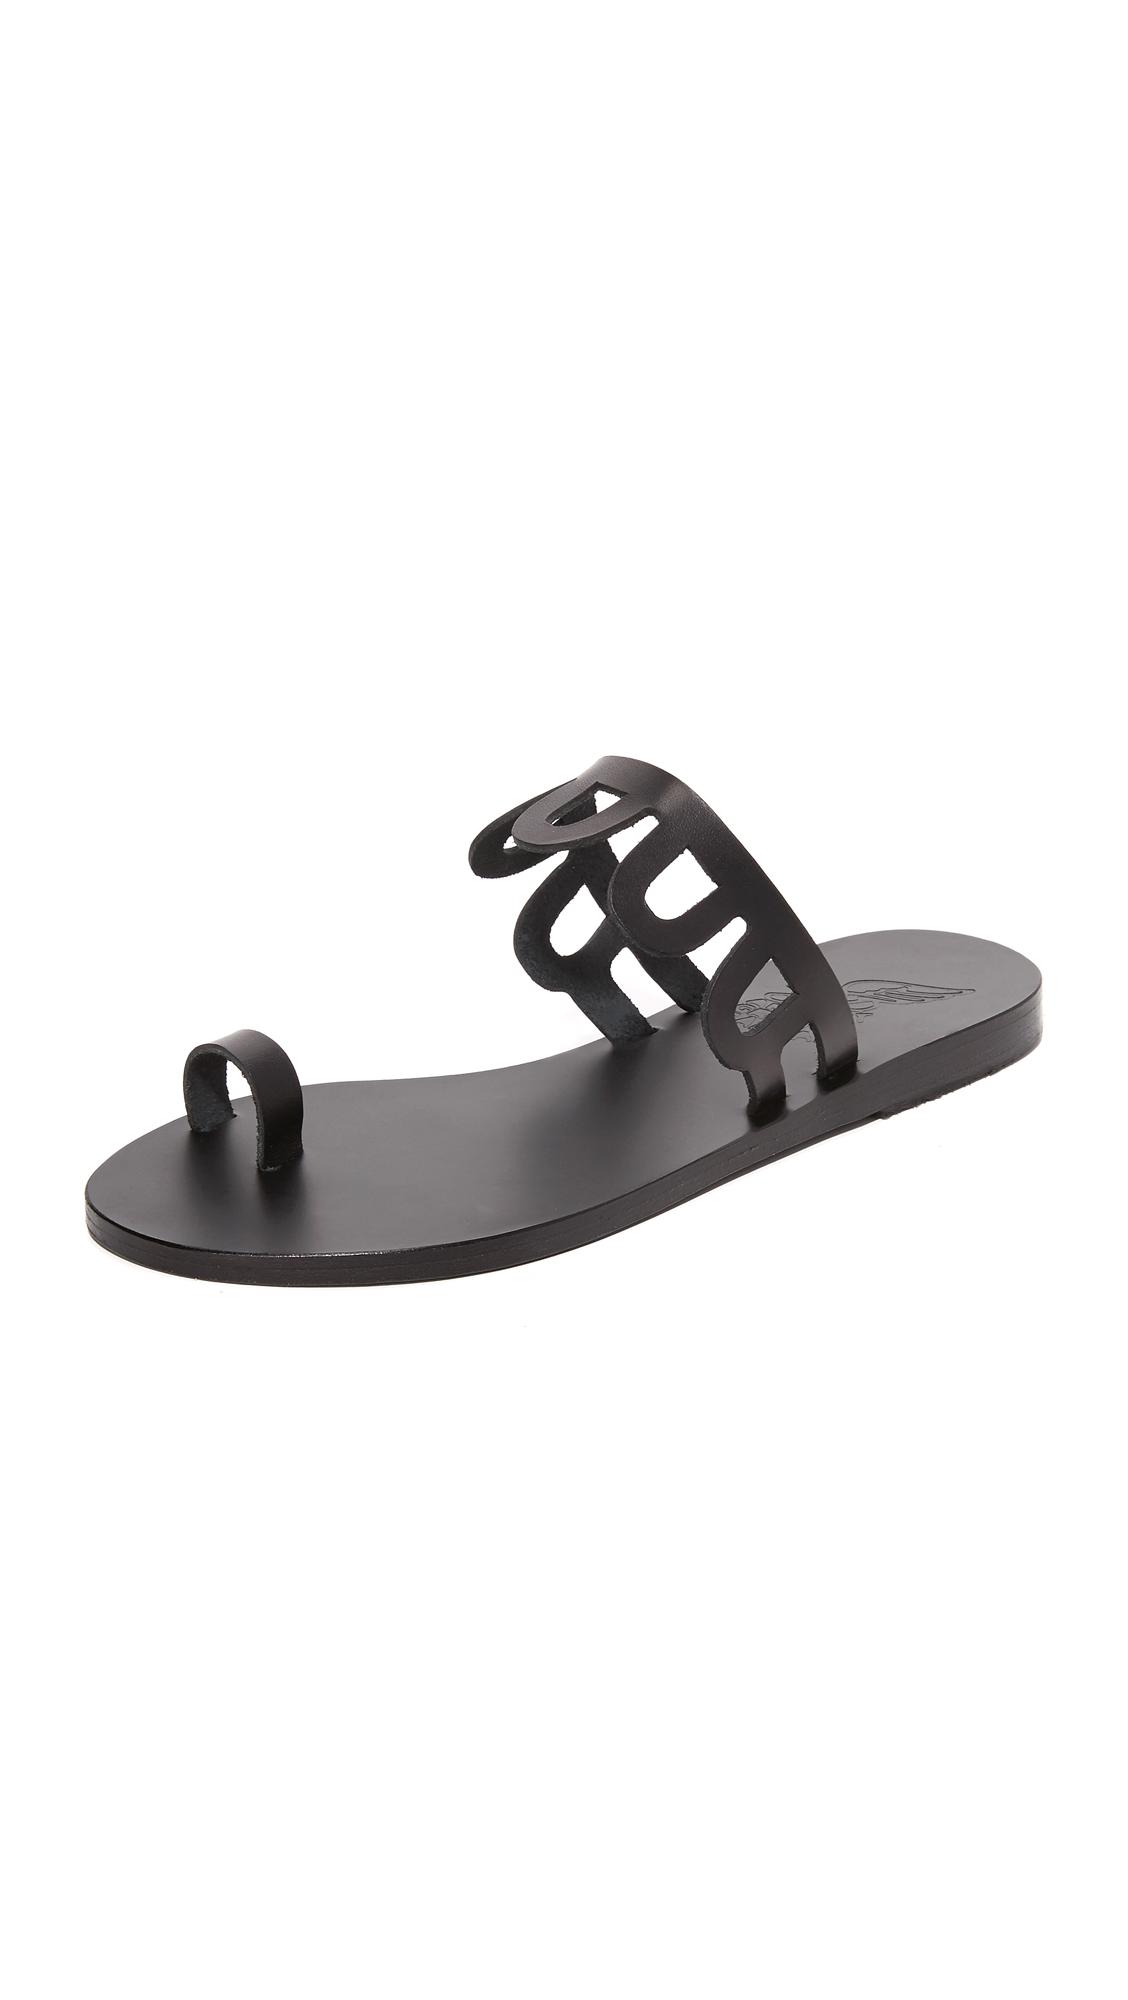 Ancient Greek Sandals Venus Toe Ring Slides - Black at Shopbop